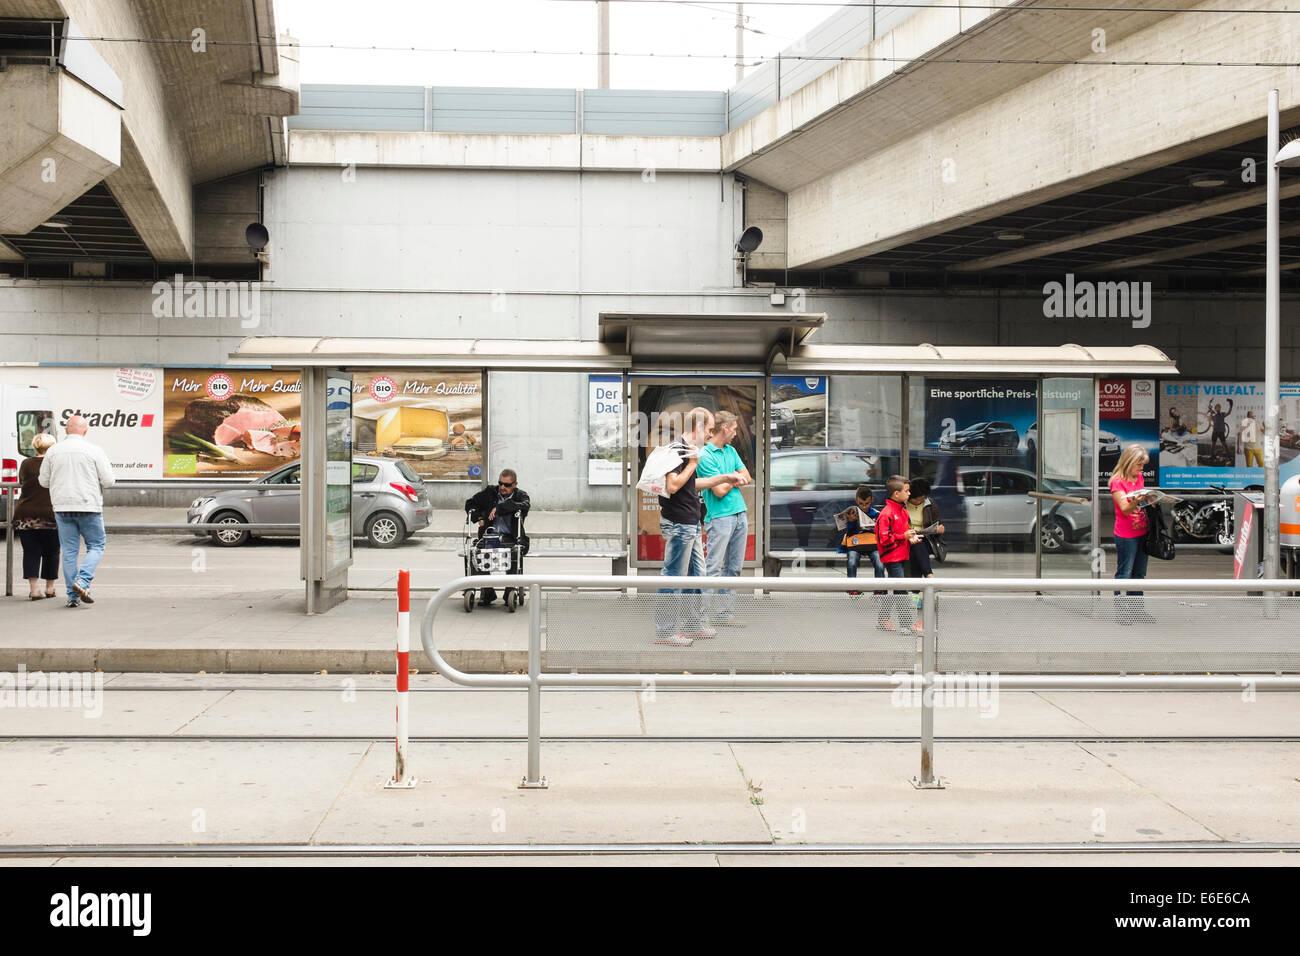 People on tram stop, Simmering, Vienna - Stock Image